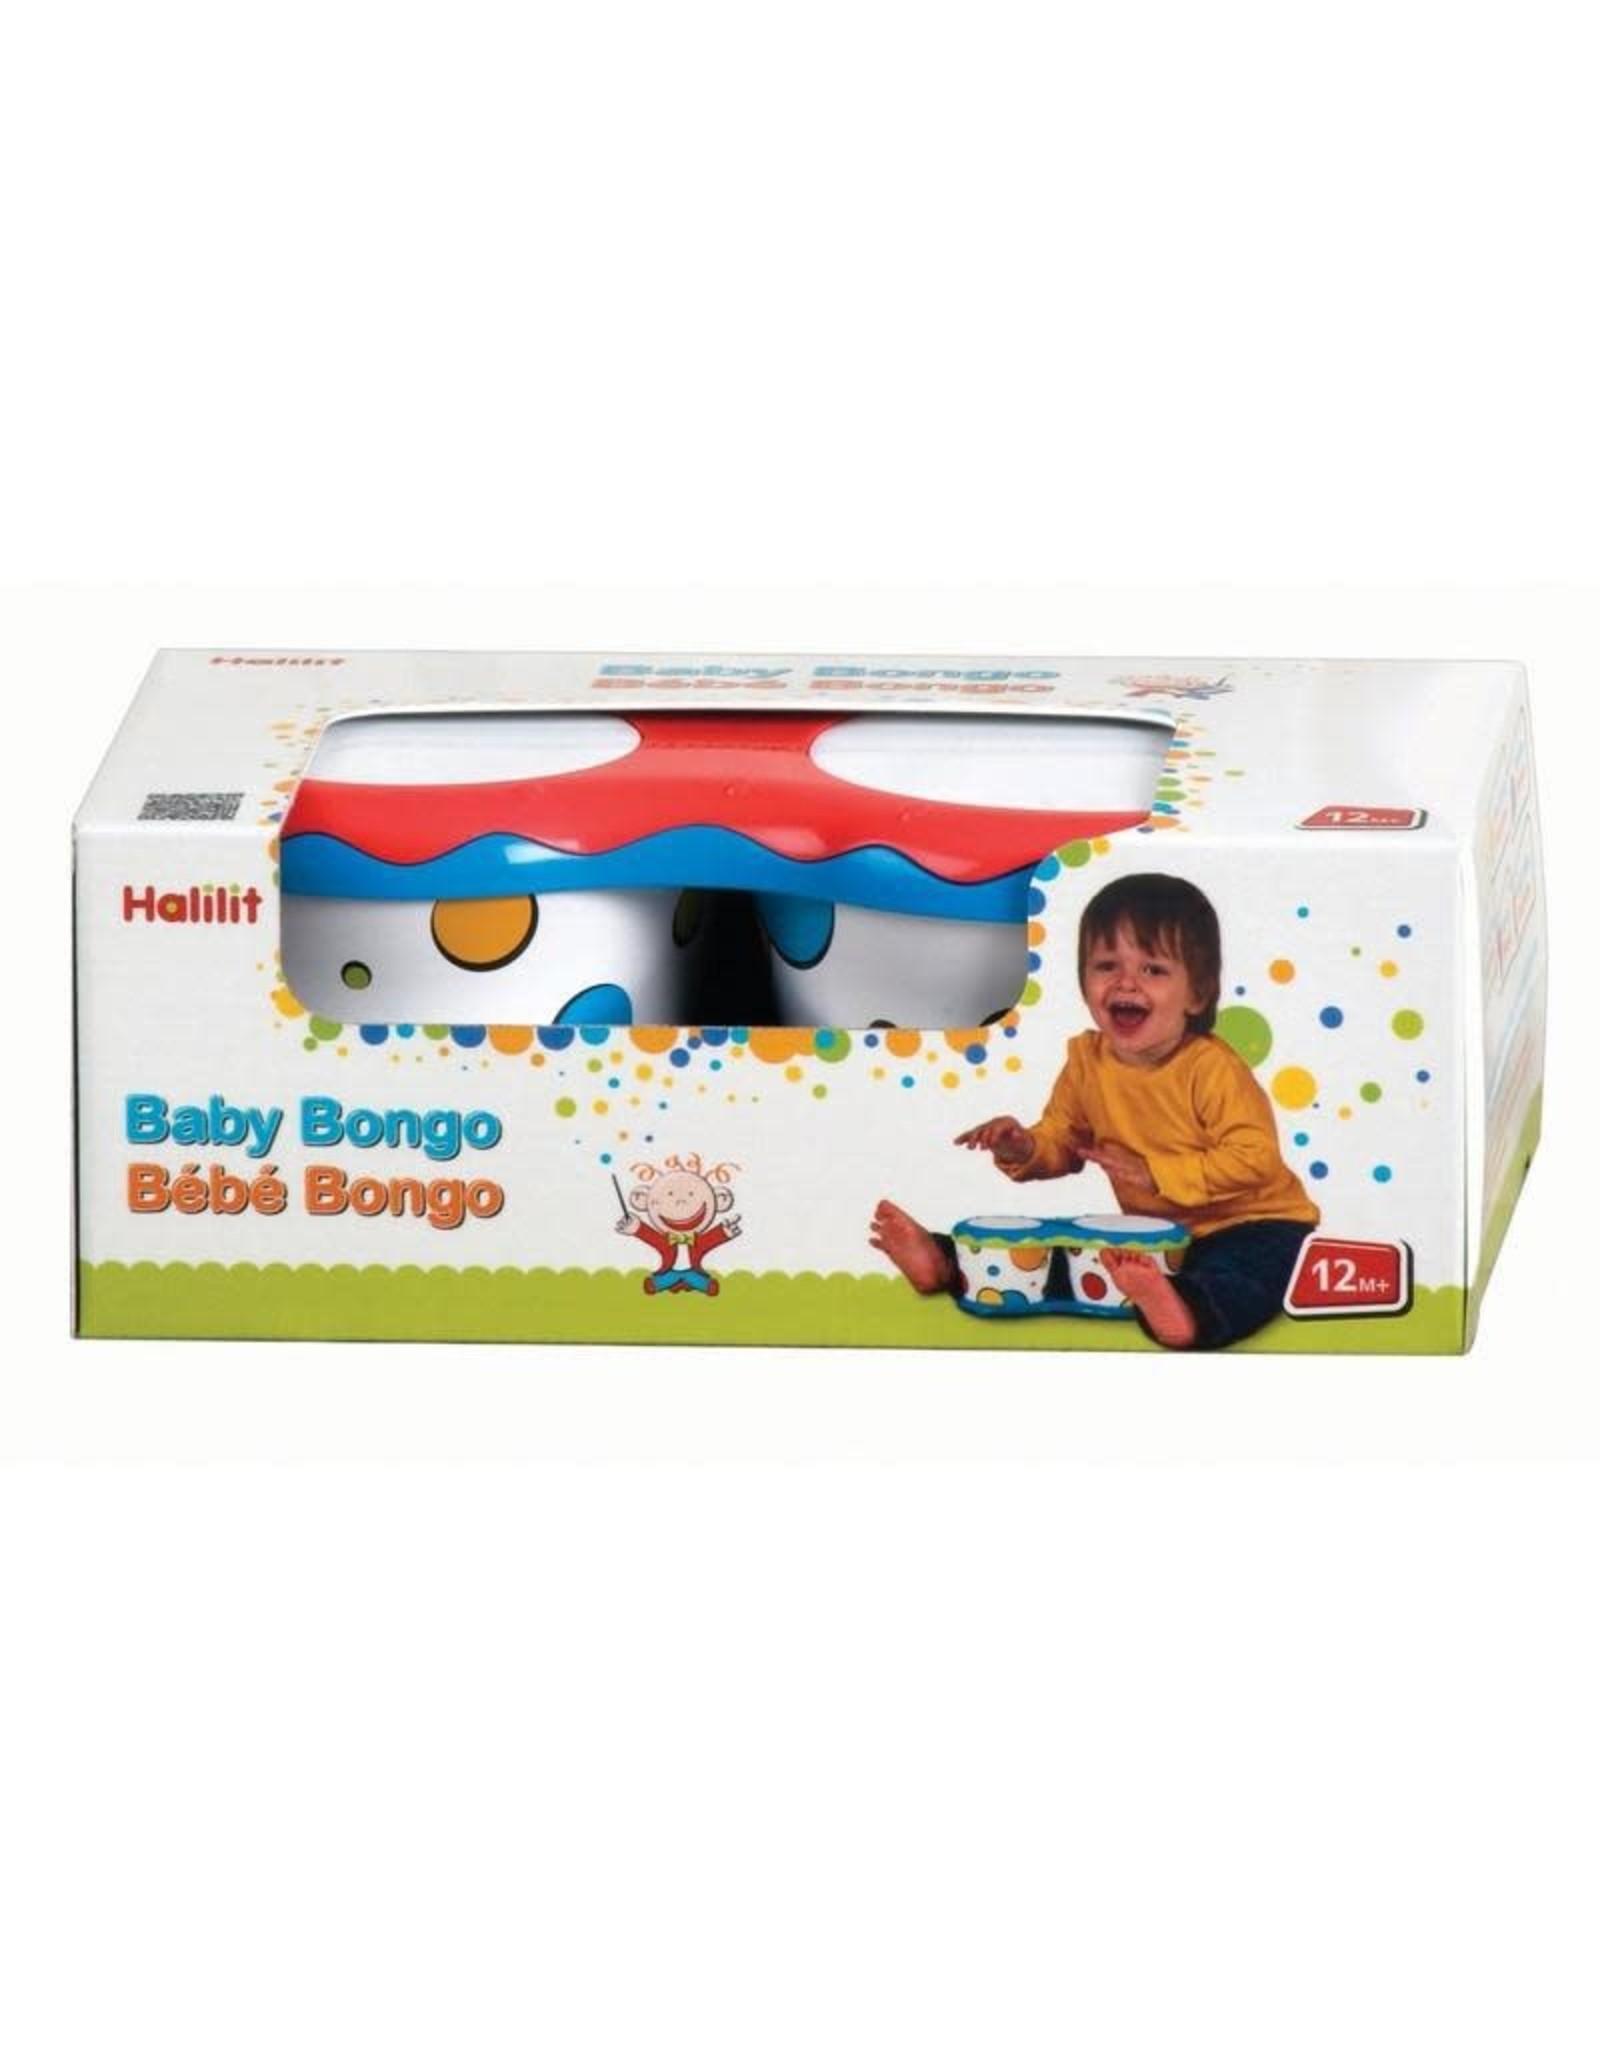 Halilit Baby Bongo By Halilit